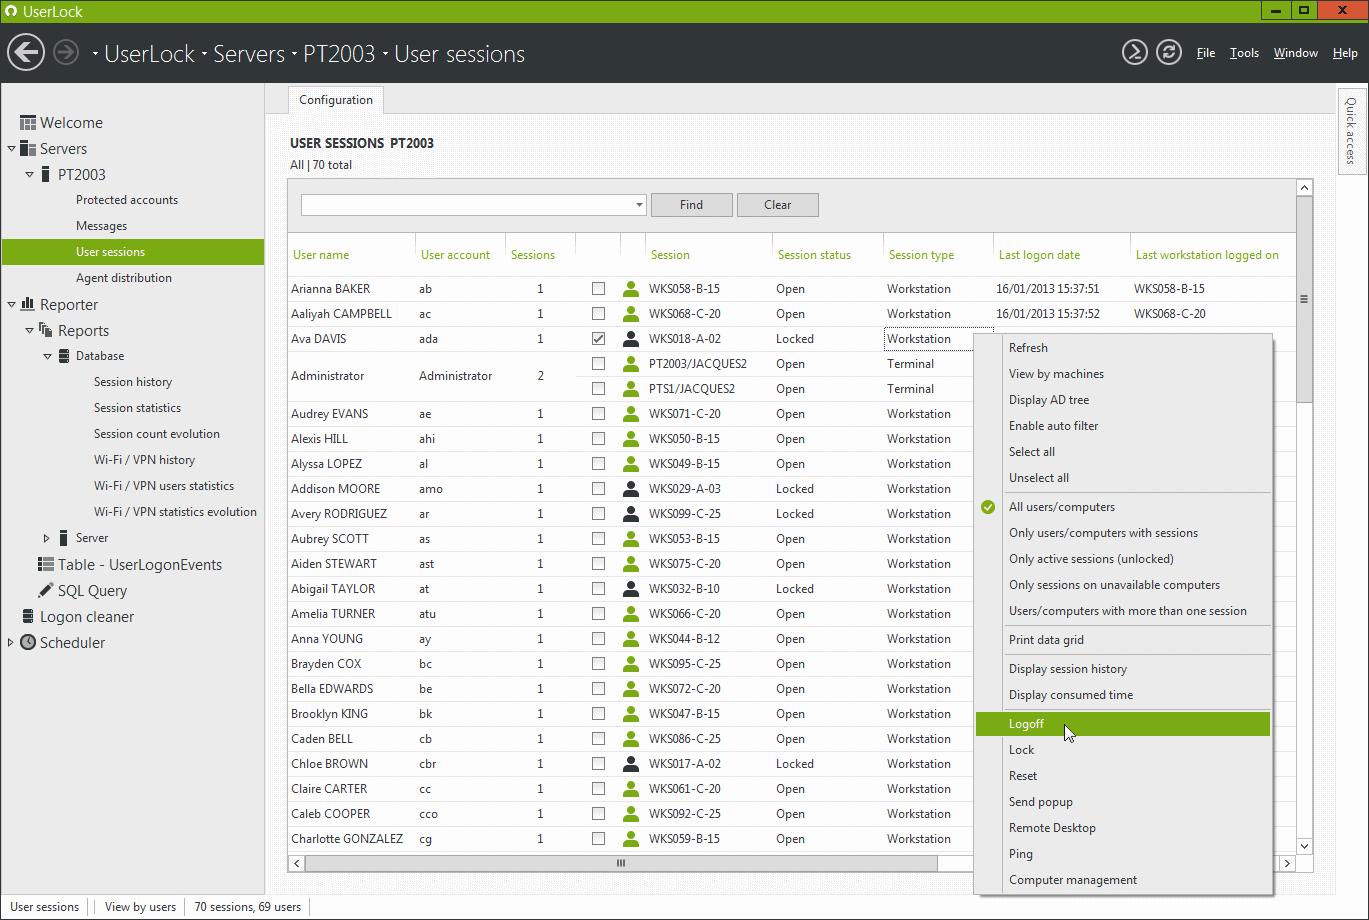 UserLock User Sessions